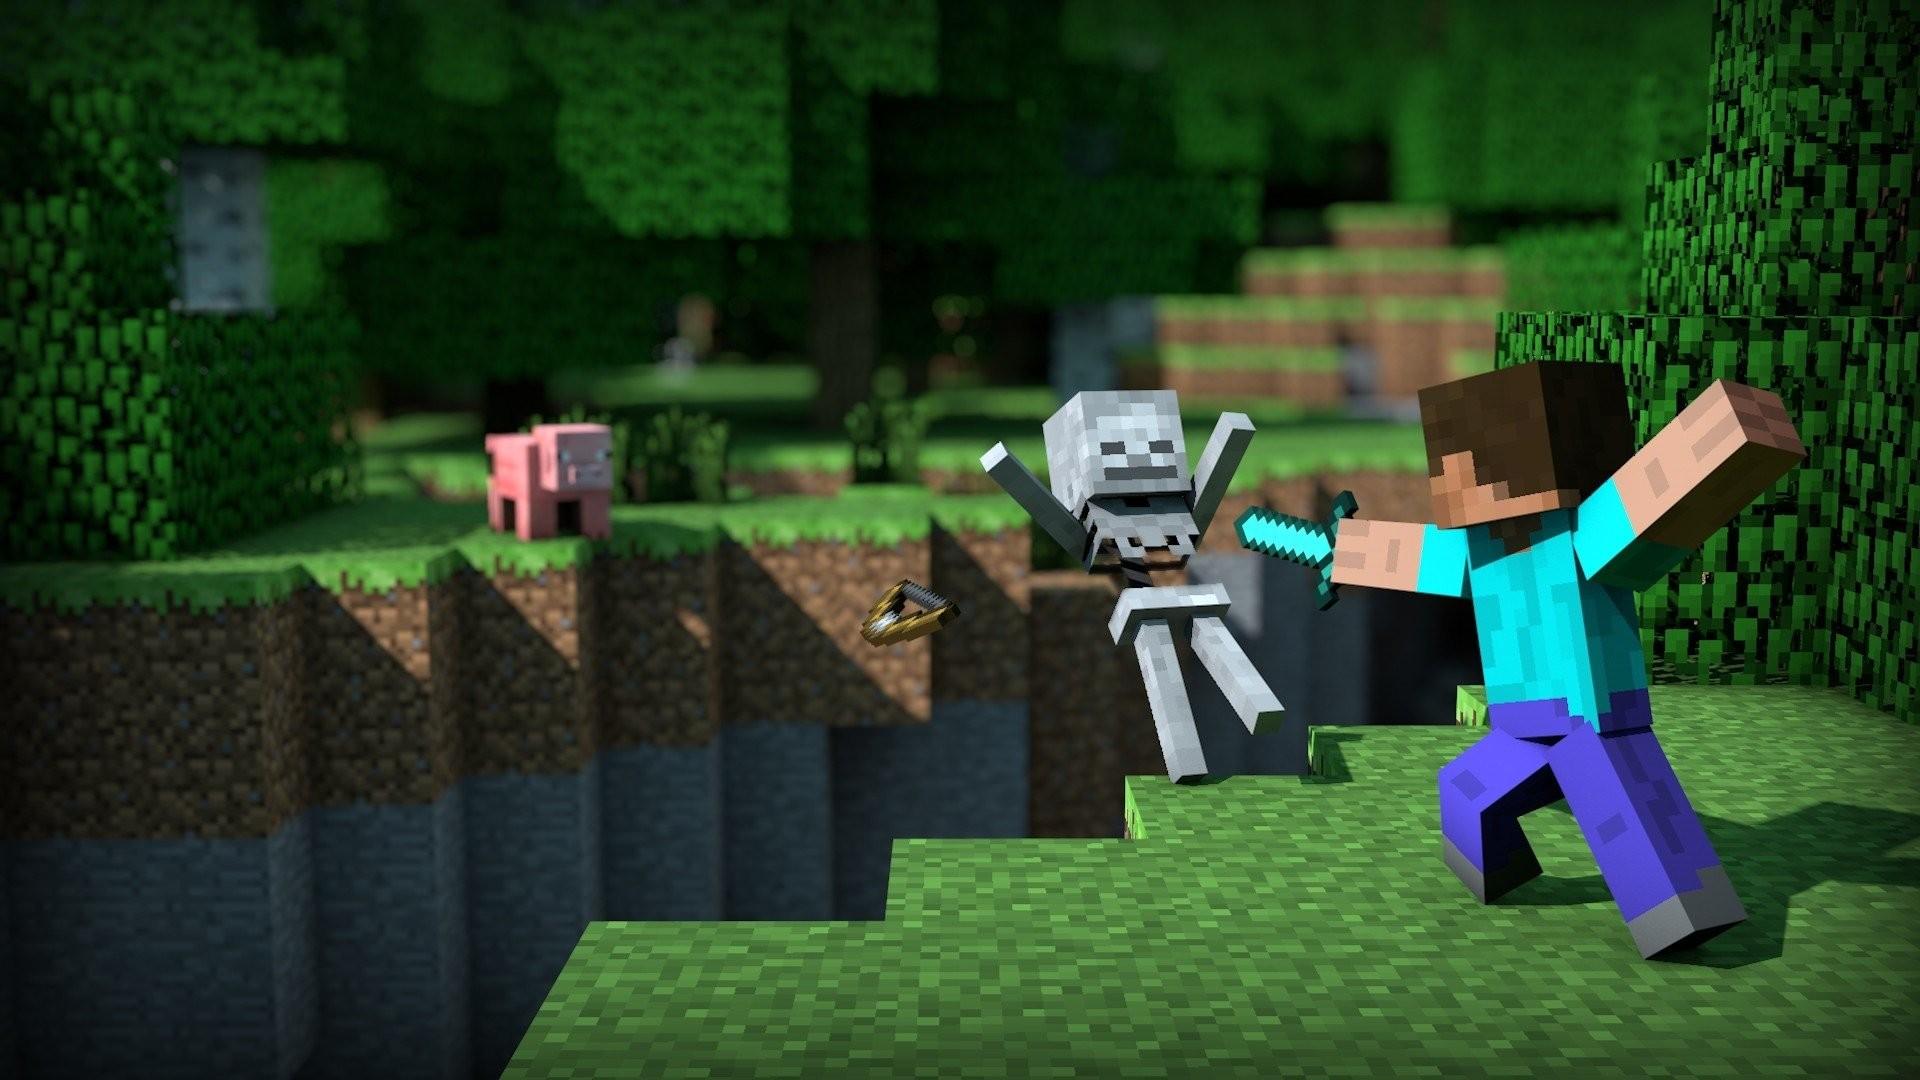 Creeper Minecraft Steve Video Game · HD Wallpaper | Background ID:246223